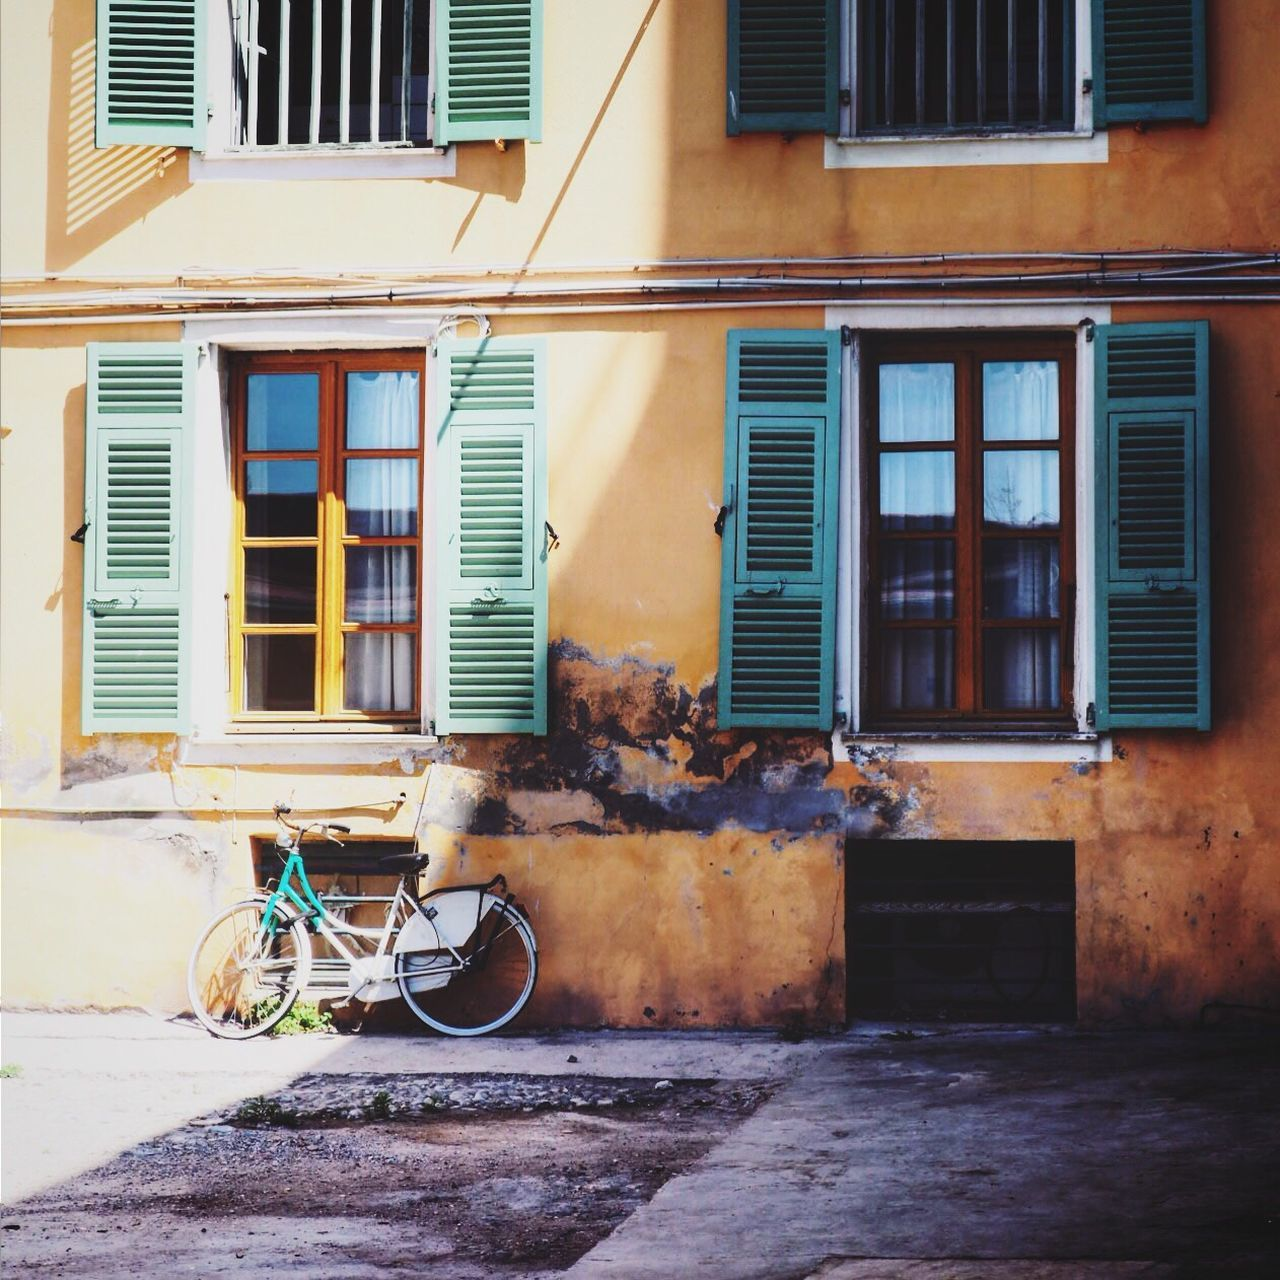 Bicycle Bike Côte D'Azur Nice Summer